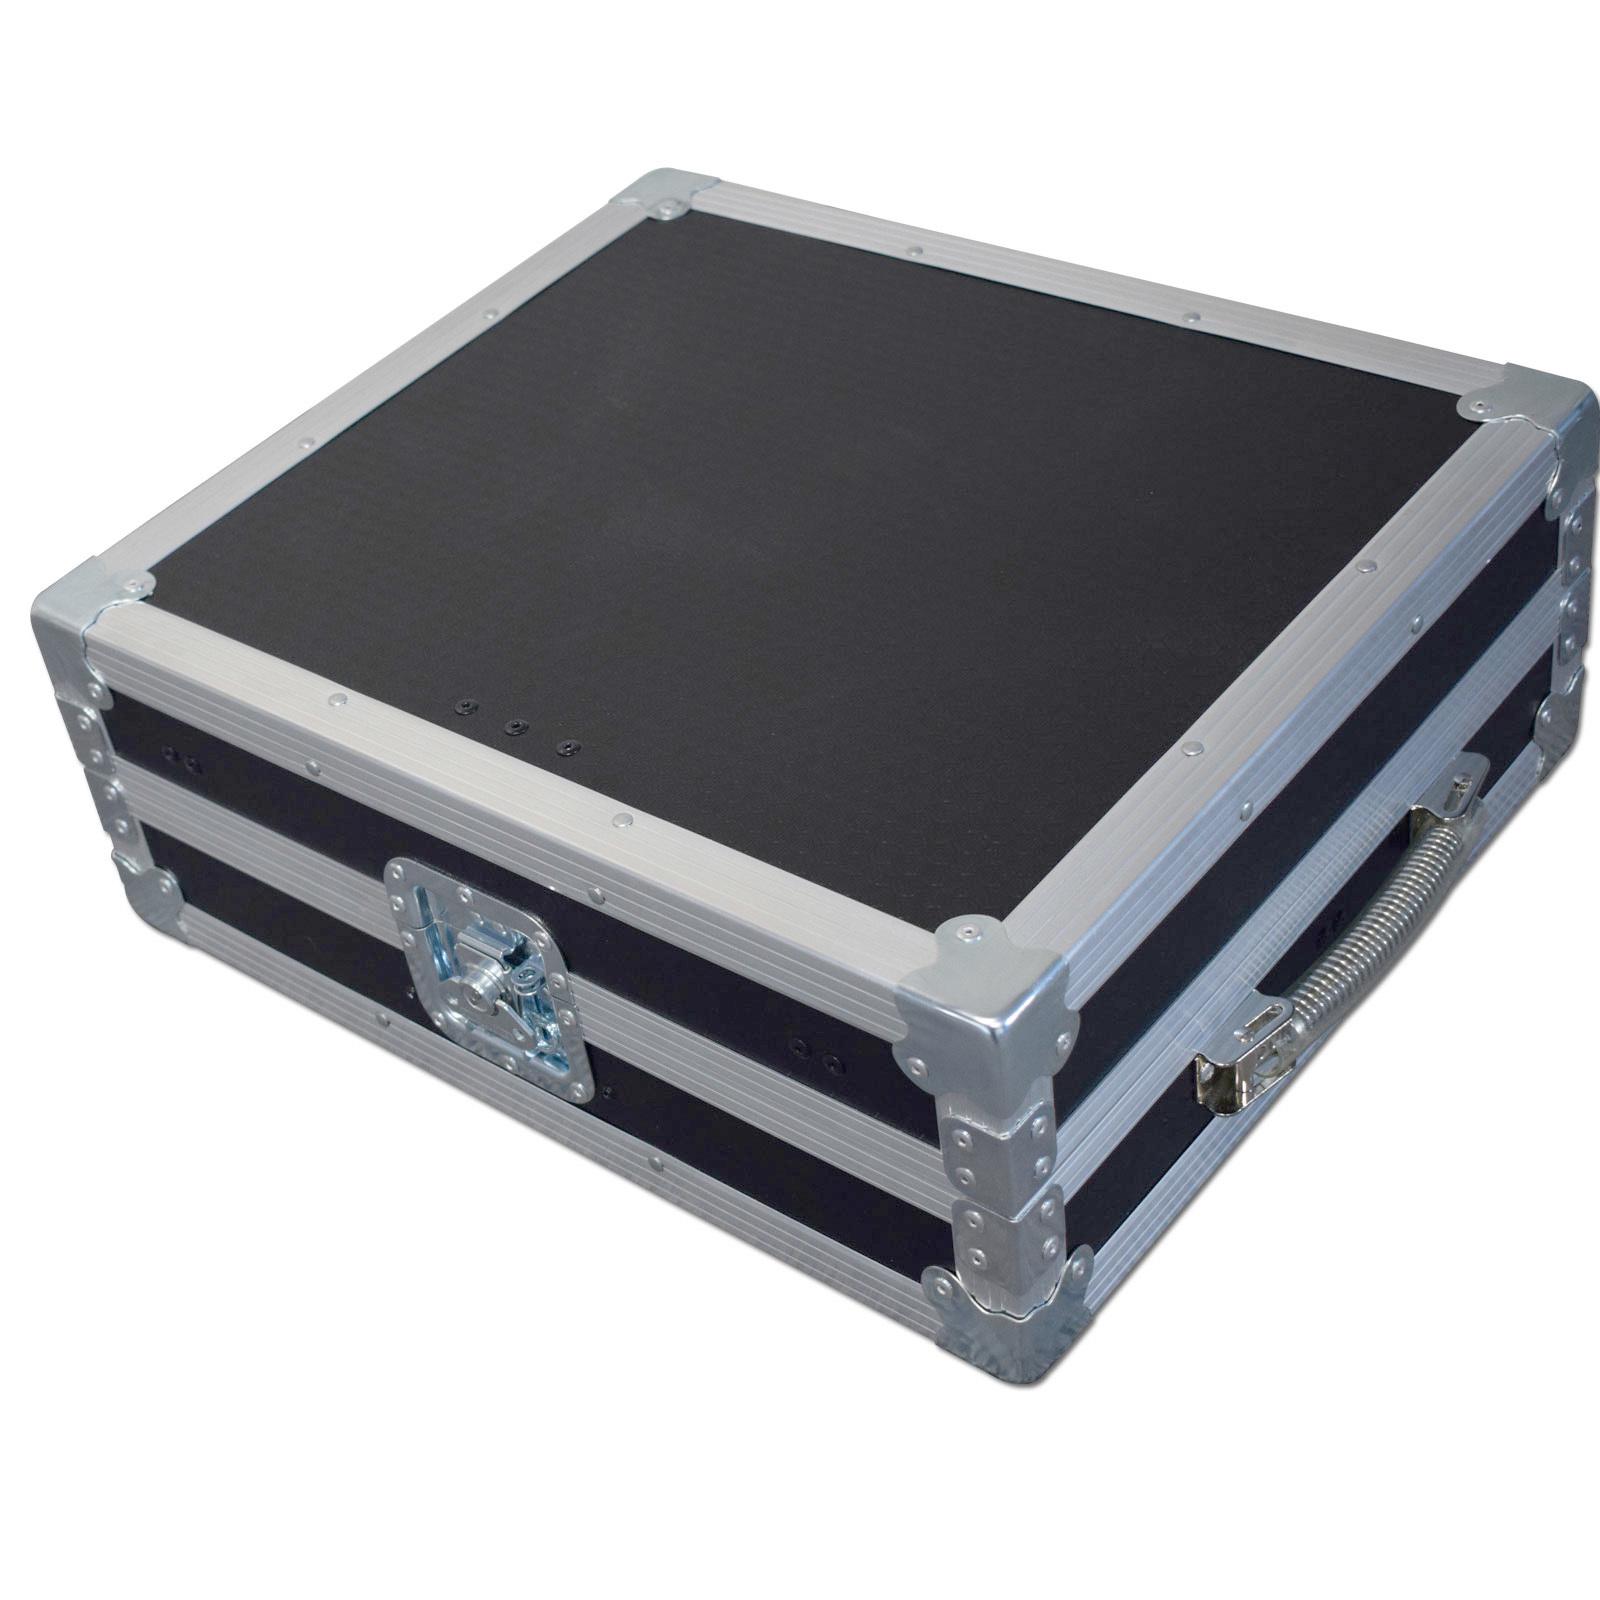 guitar tech flight case. Black Bedroom Furniture Sets. Home Design Ideas